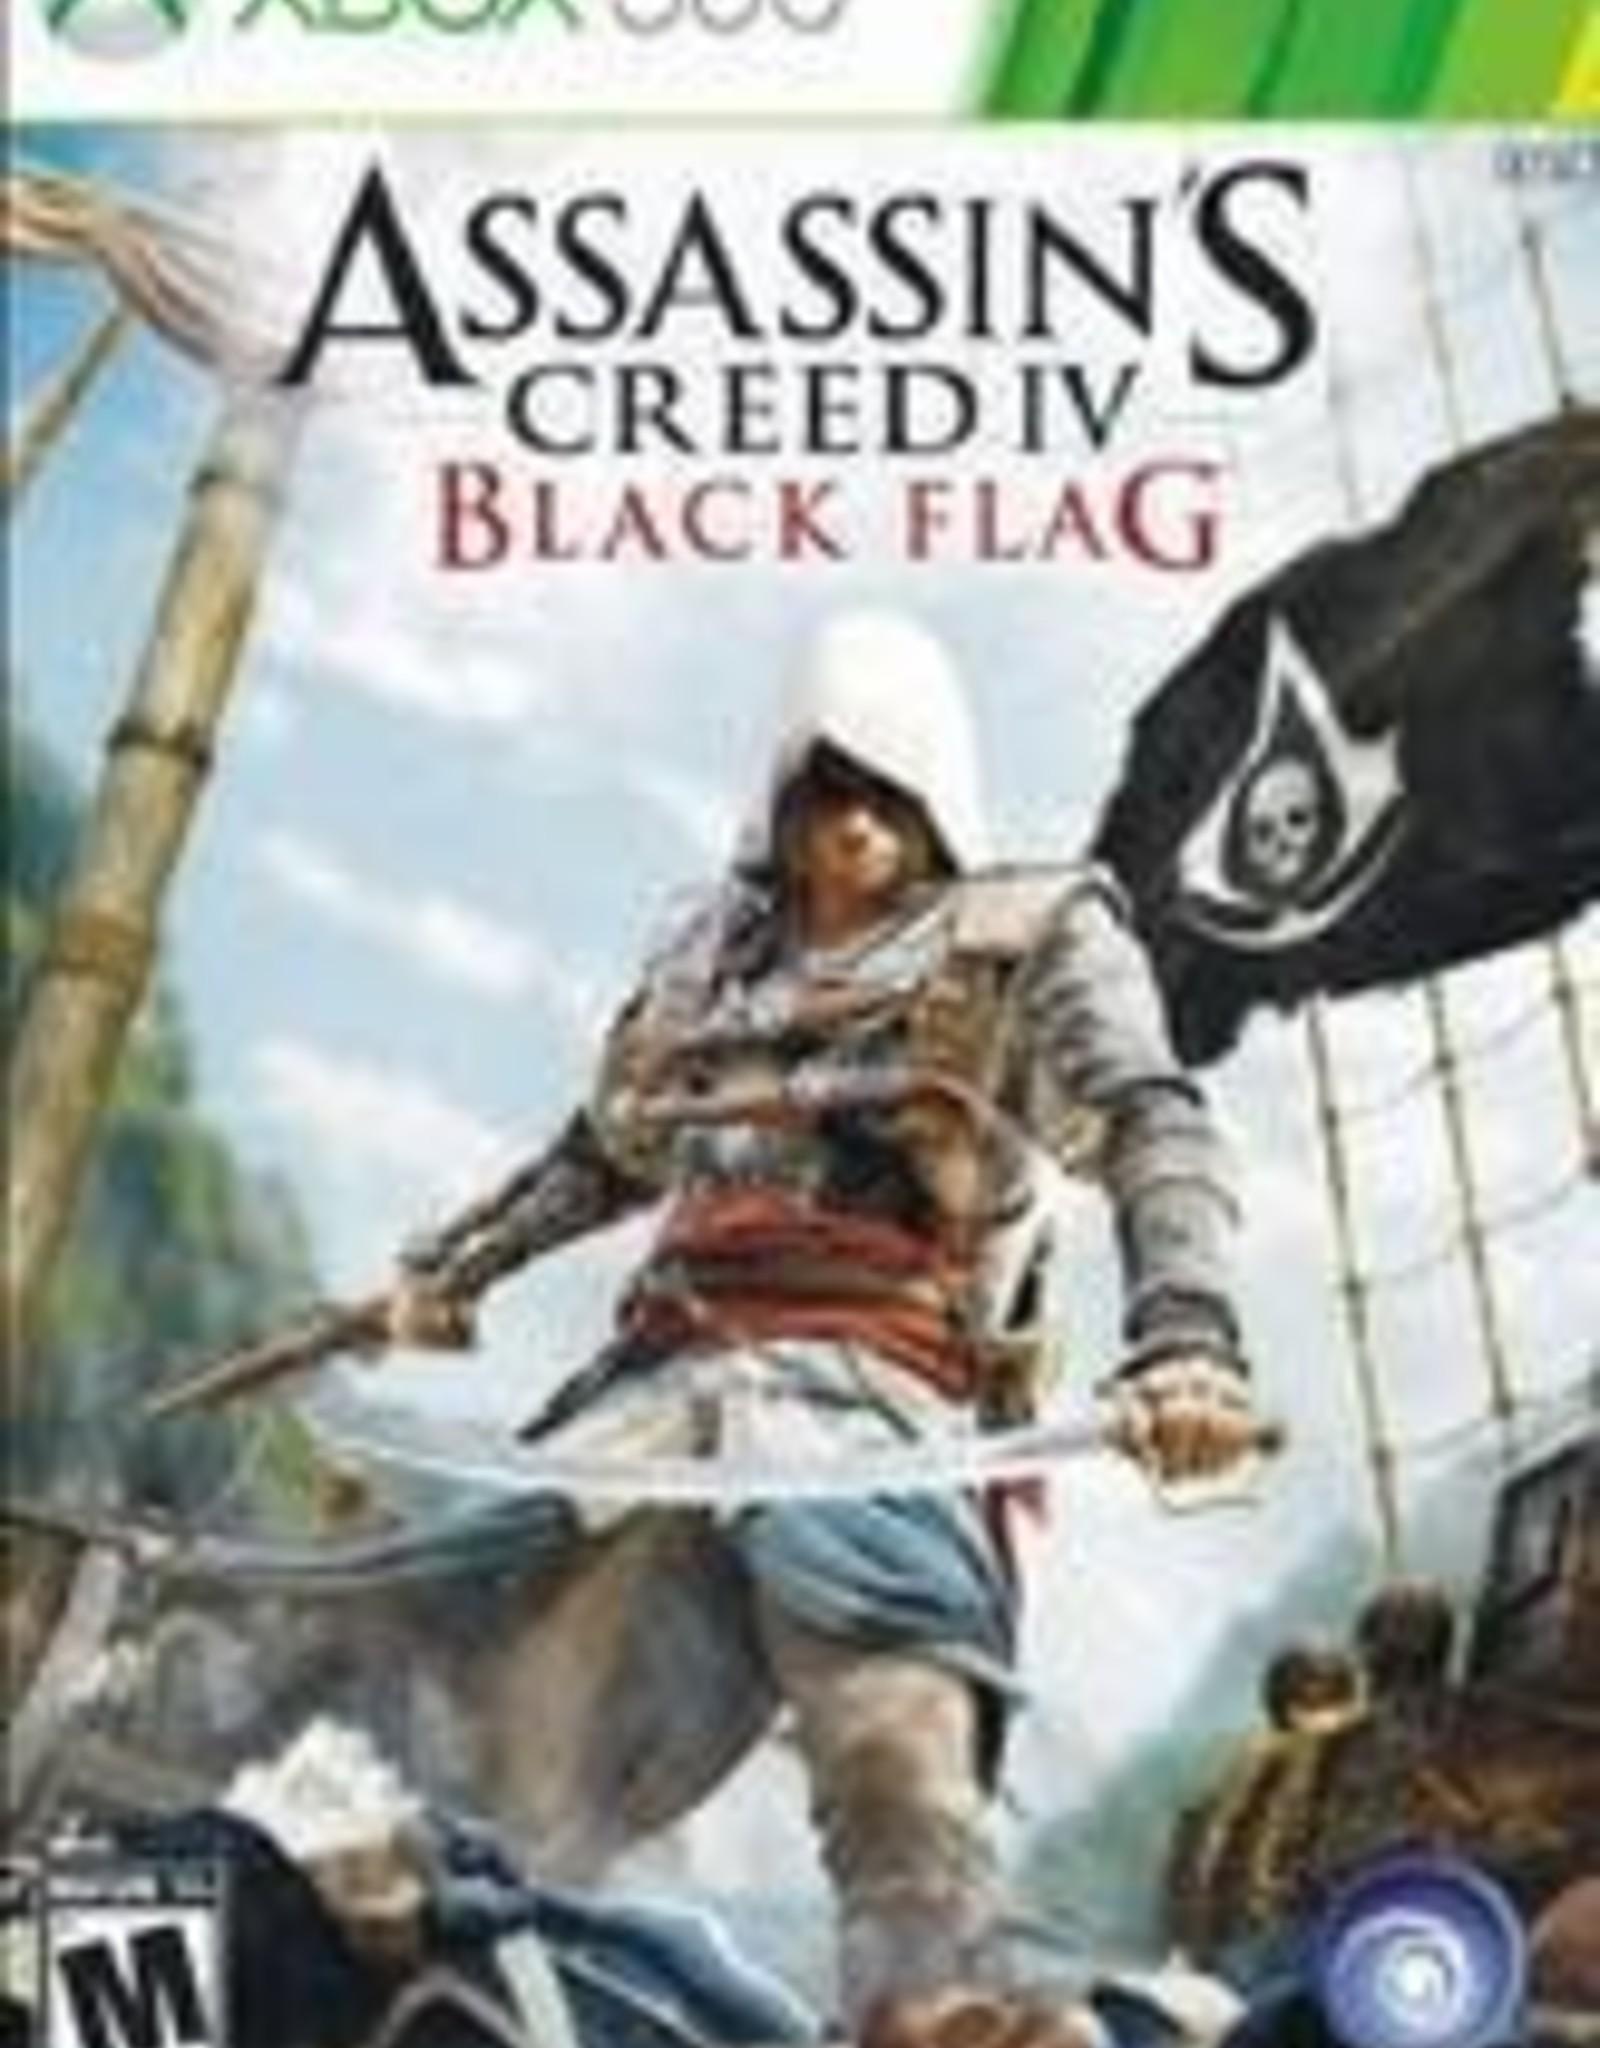 Xbox 360 Assassin's Creed IV: Black Flag